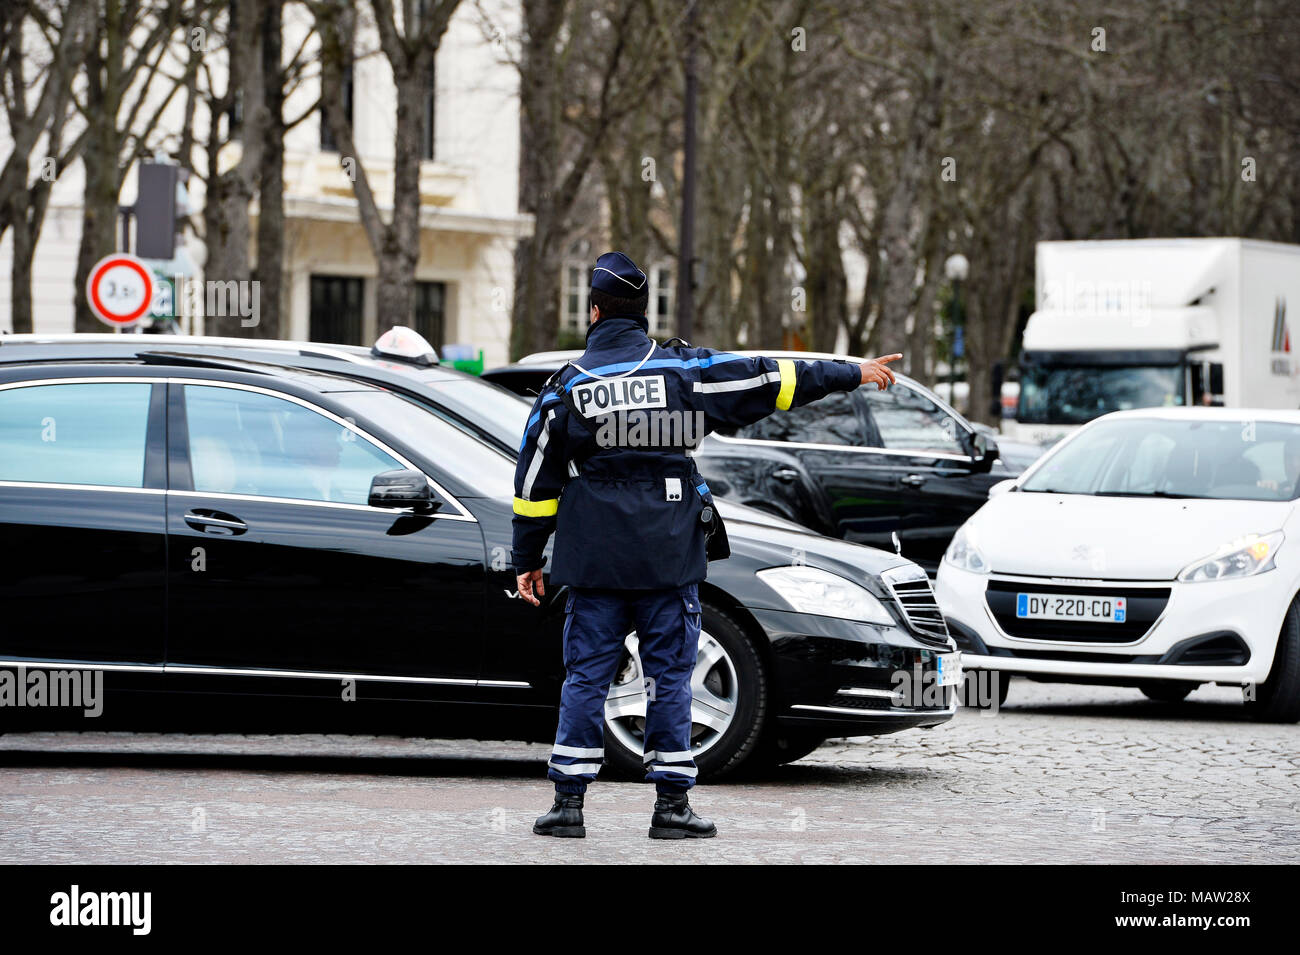 Polizei Verkehr régulation - Paris - Frankreich Stockbild